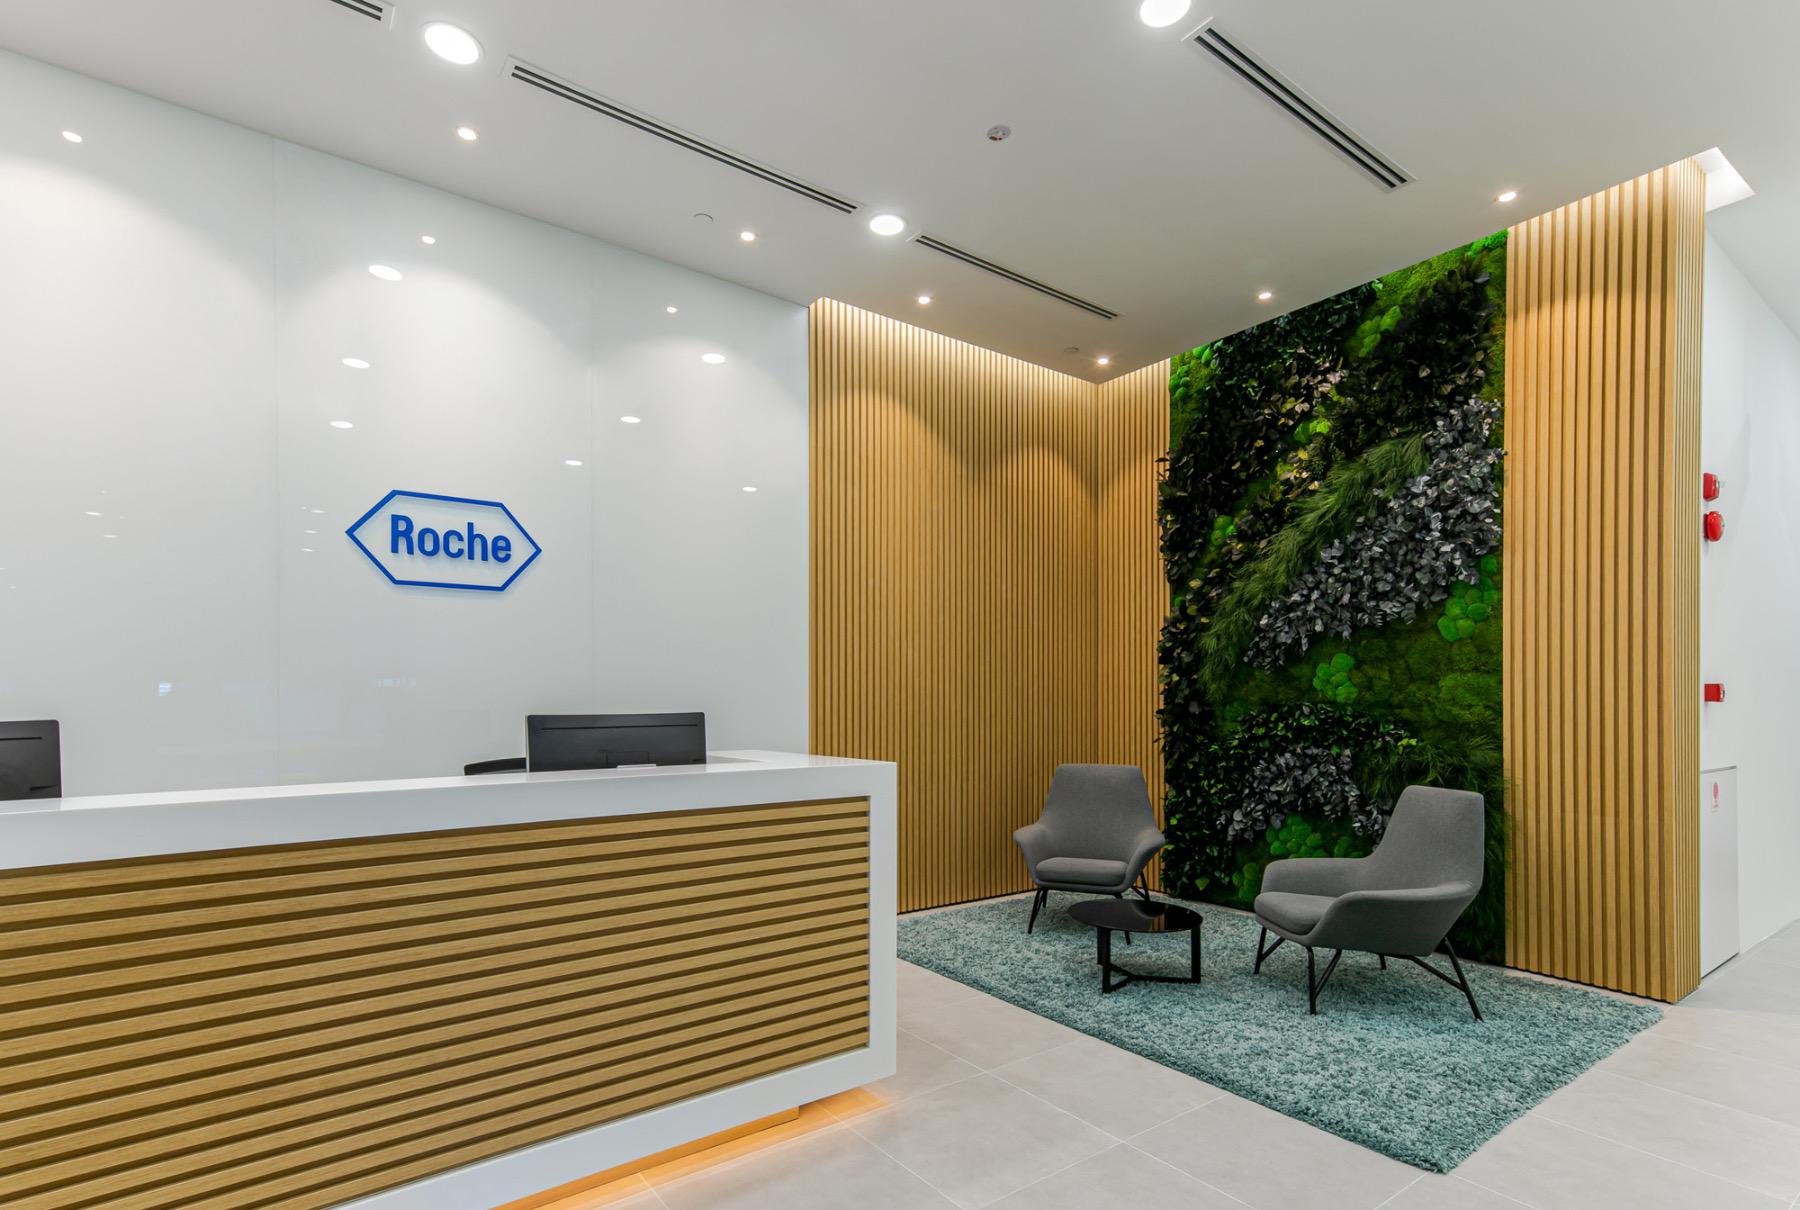 roche-office-singapore-2